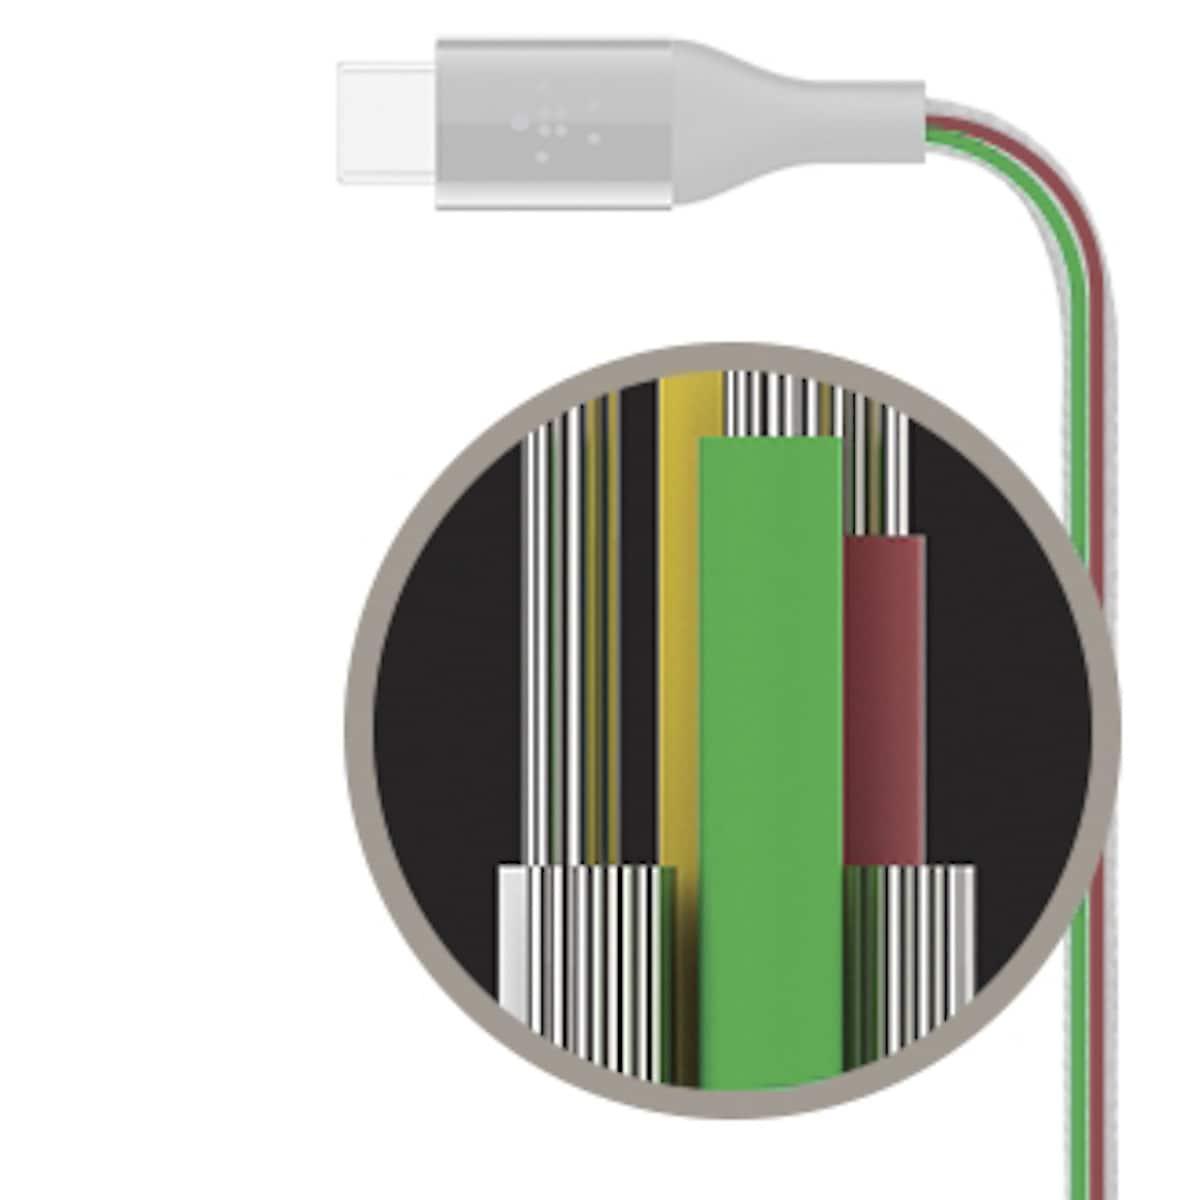 USB-C-kabel, Belkin Mixit DuraTek